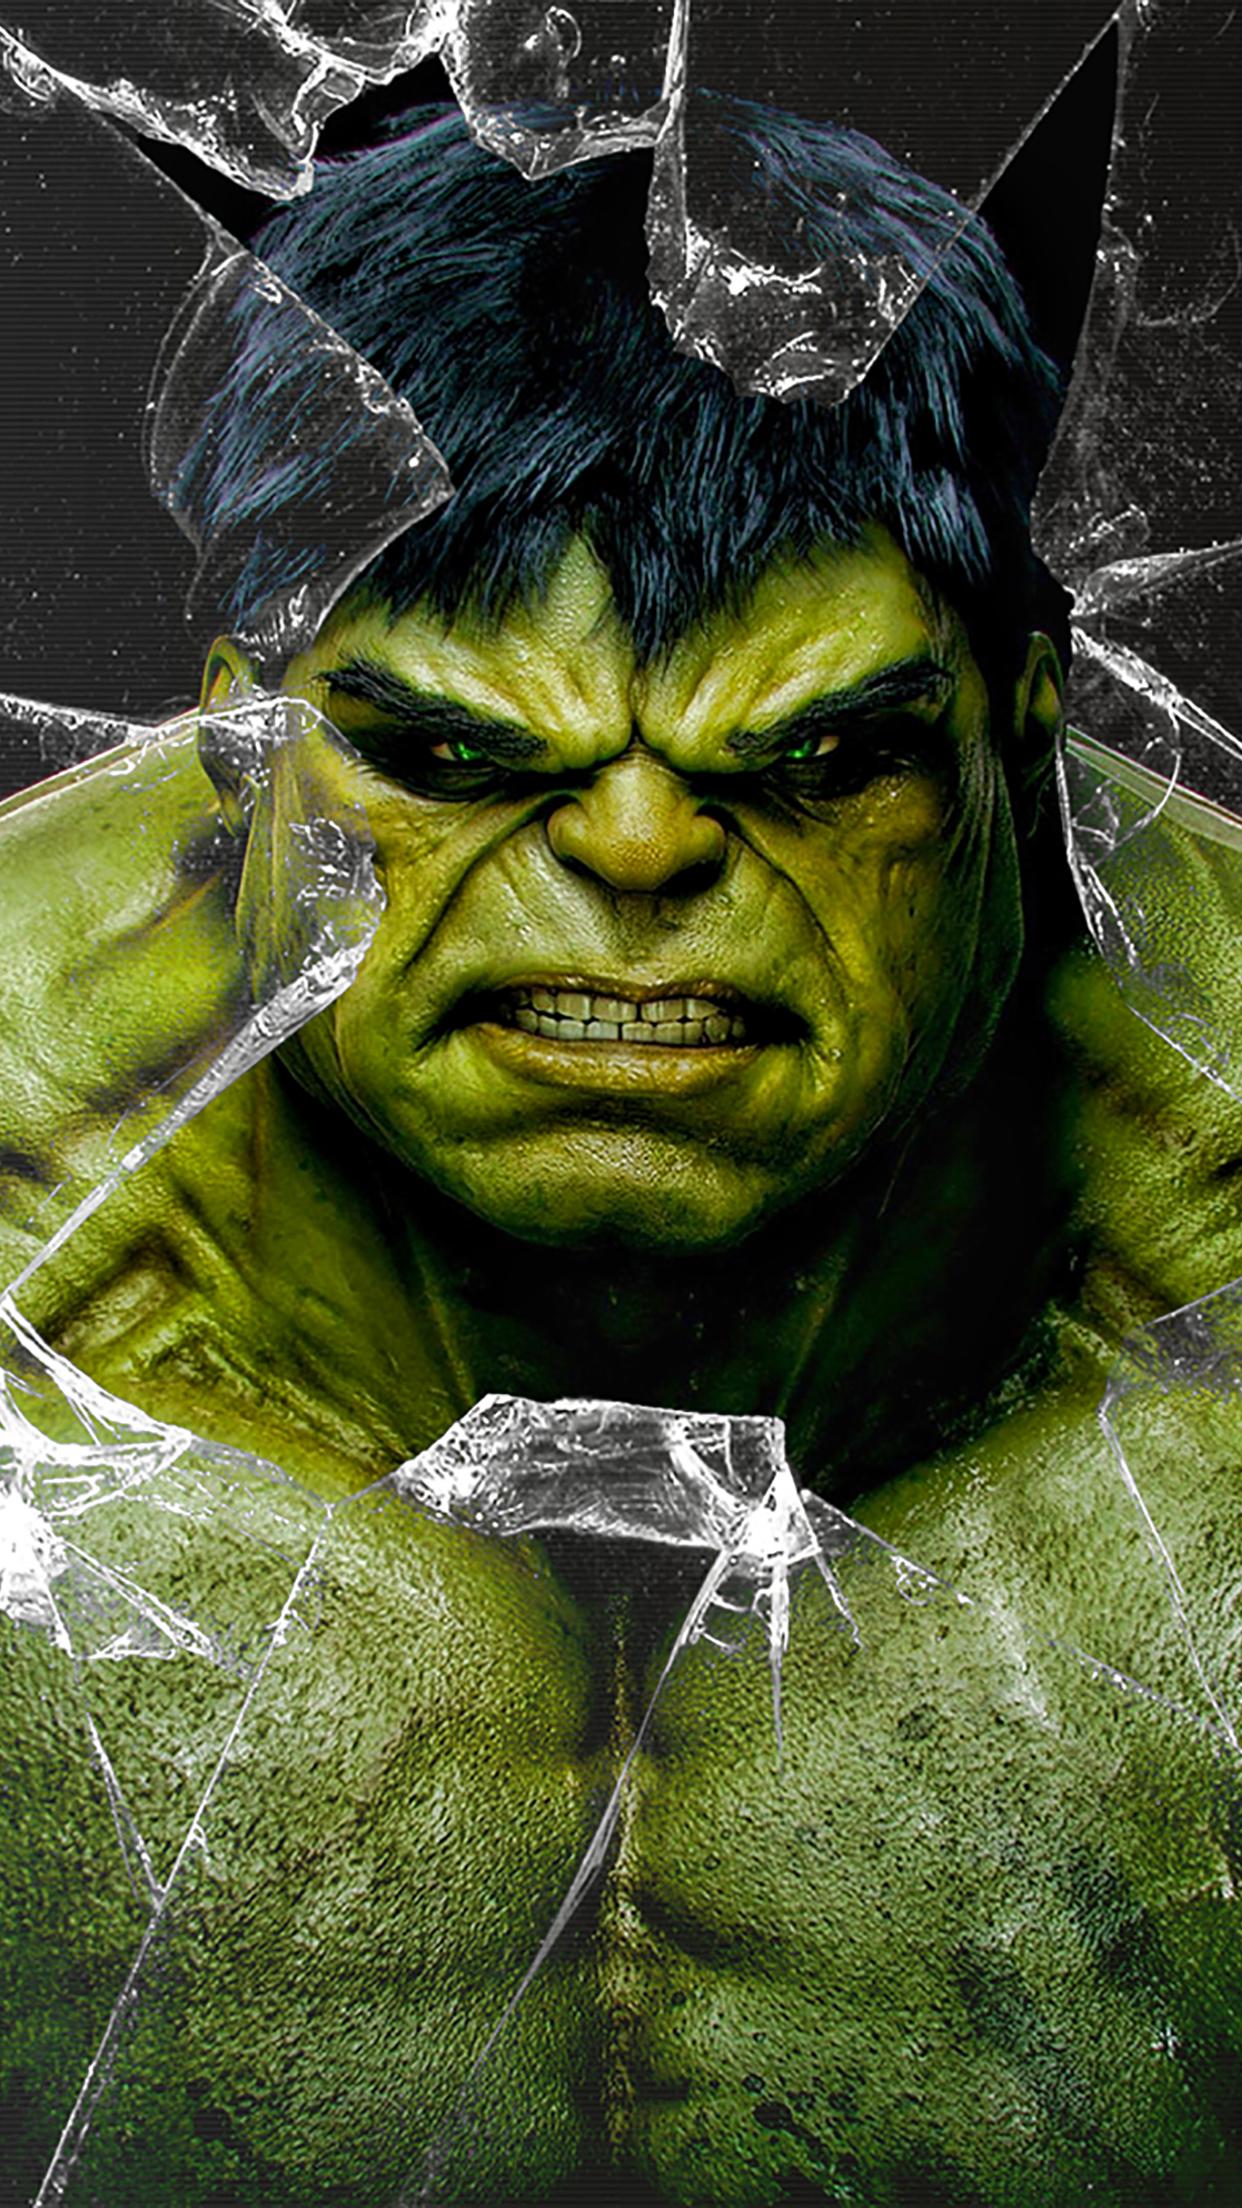 hulk broken glass wallpaper for iphone x 8 7 6 free